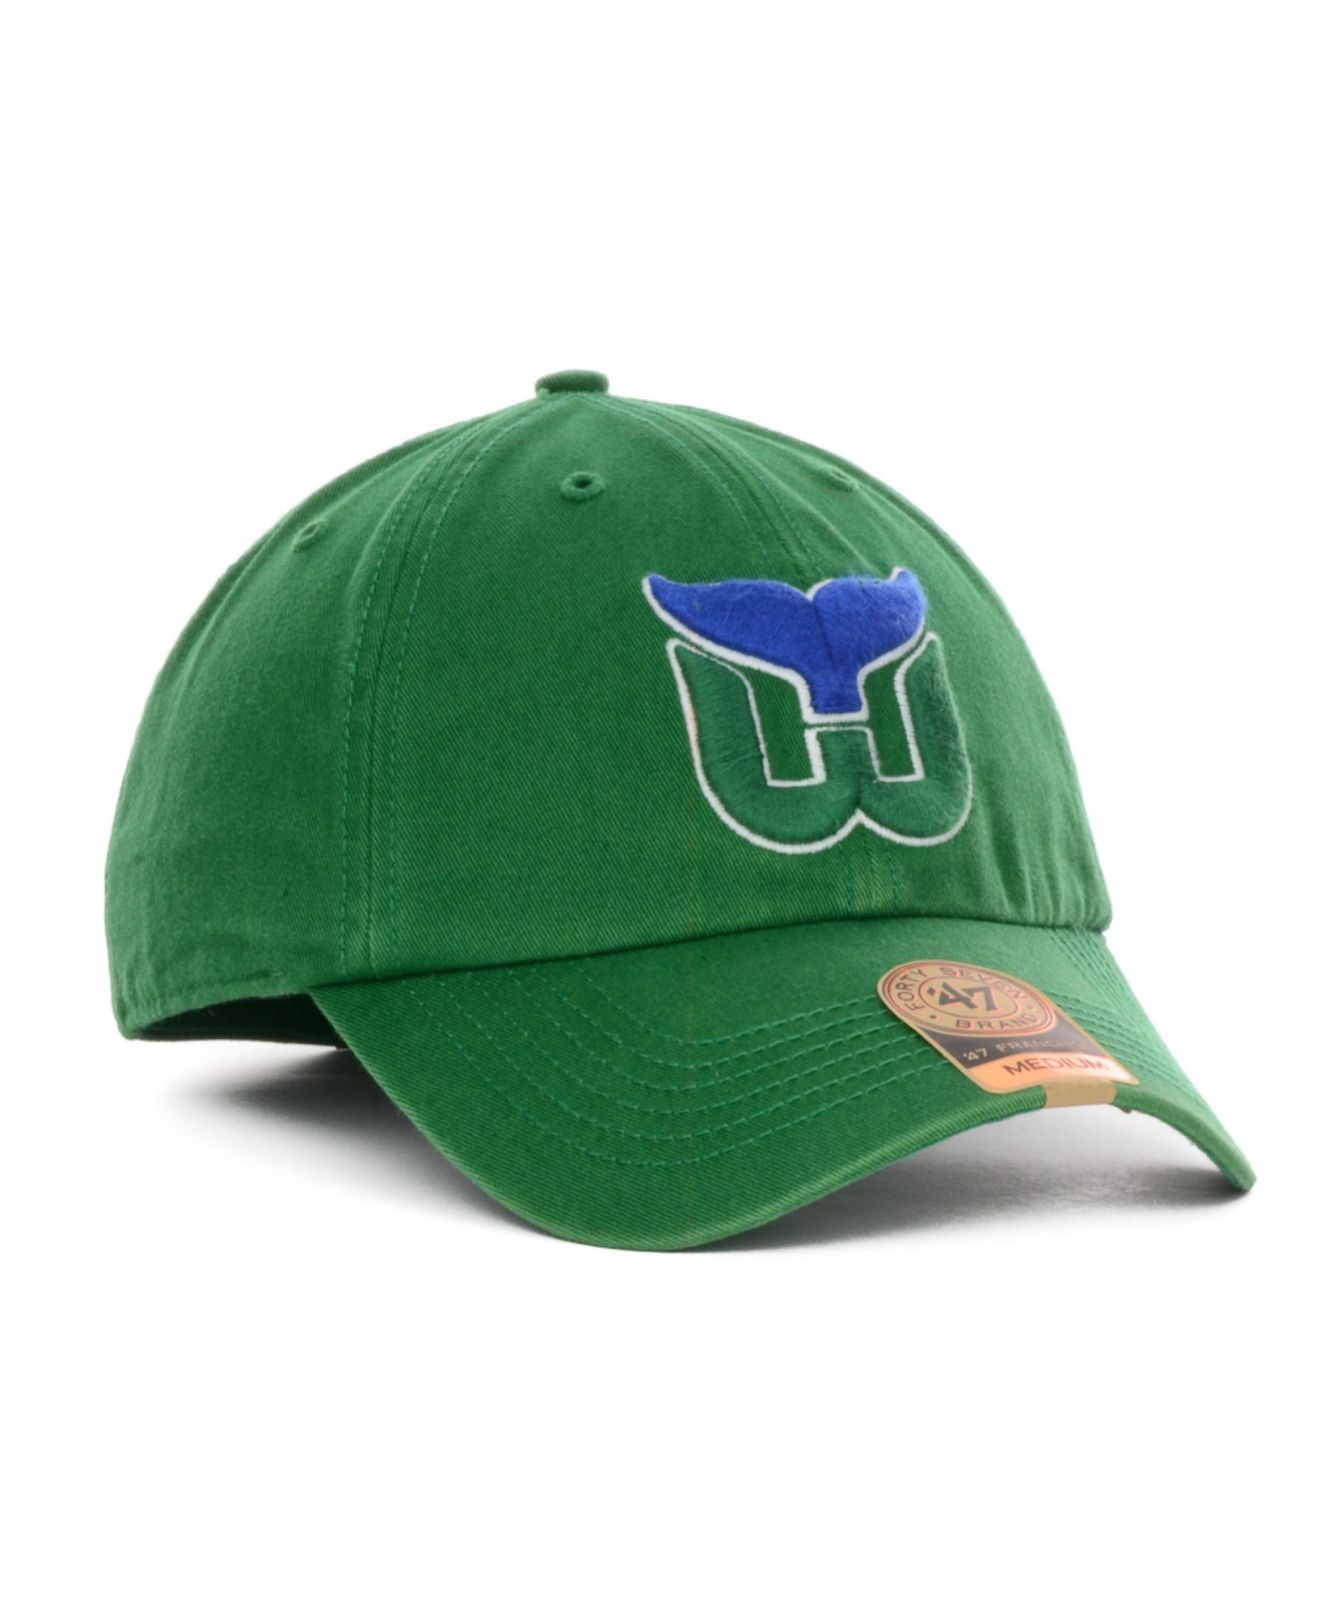 Lyst - 47 Brand Hartford Whalers Vintage Franchise Cap in Green for Men f30bb7d1b59